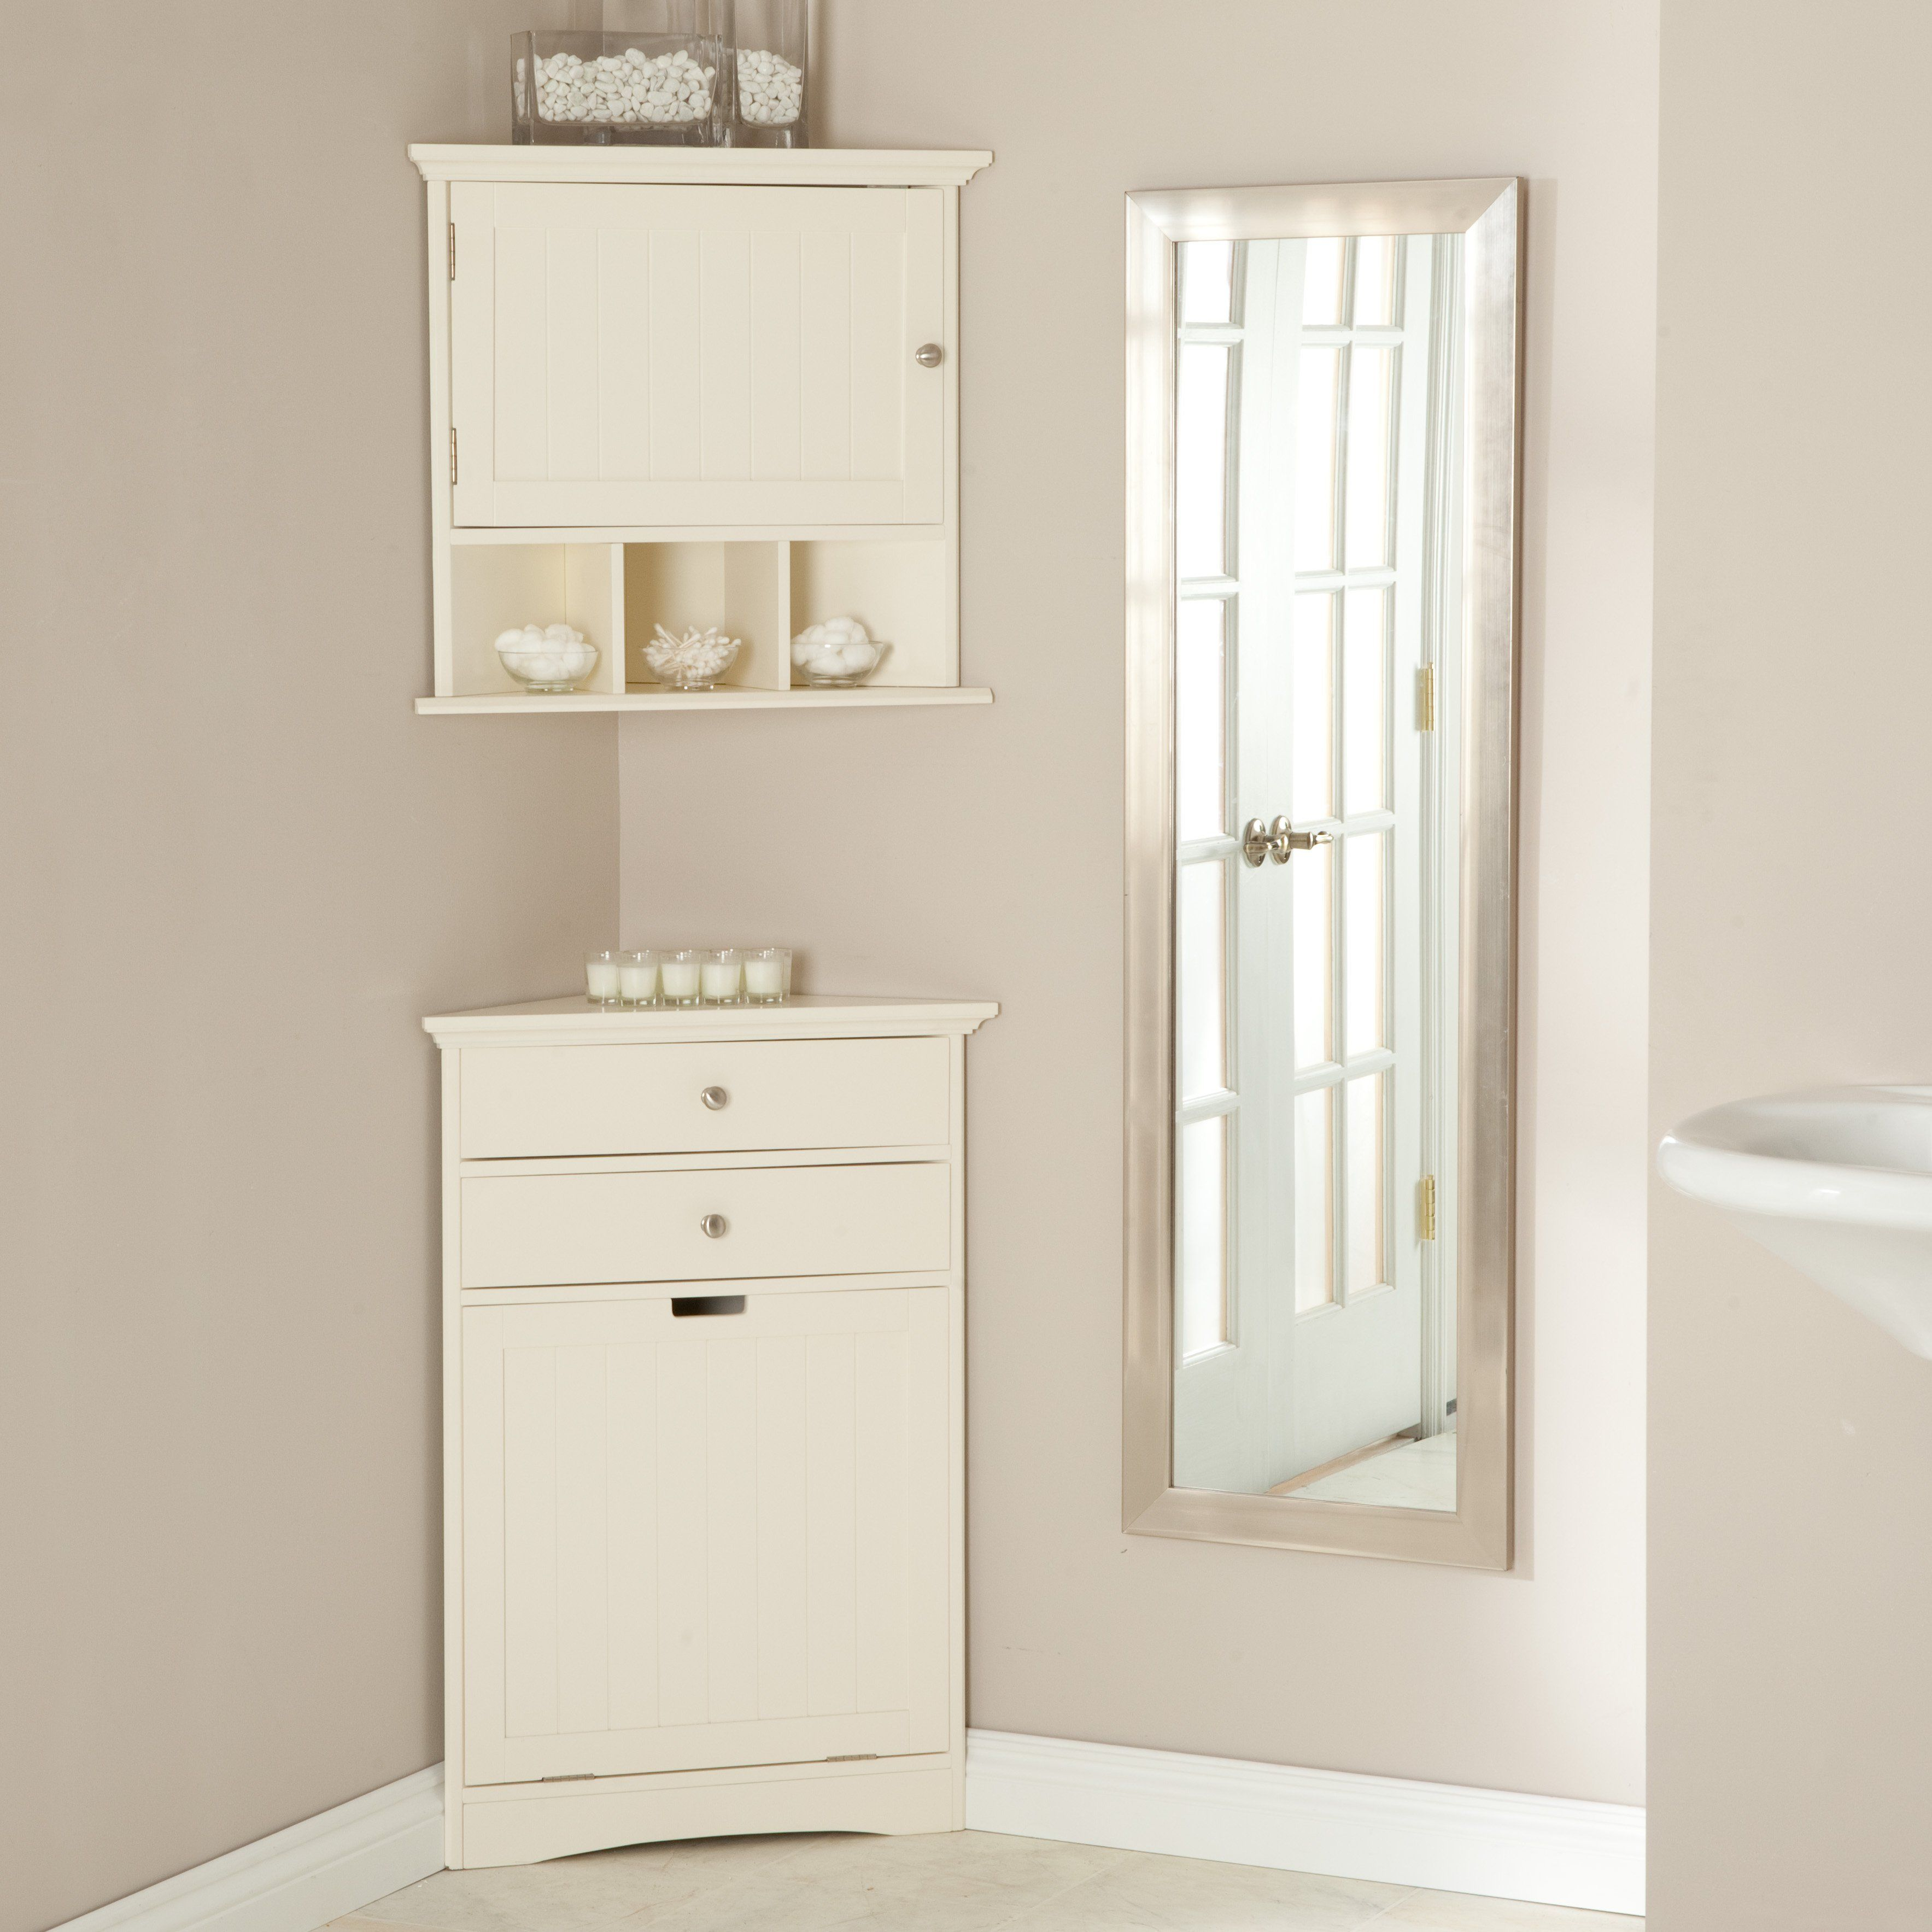 Cirrus Corner Wall Cabinet Hamper Www Hayneedle Com Bathroom Corner Cabinet Corner Storage Cabinet Corner Linen Cabinet